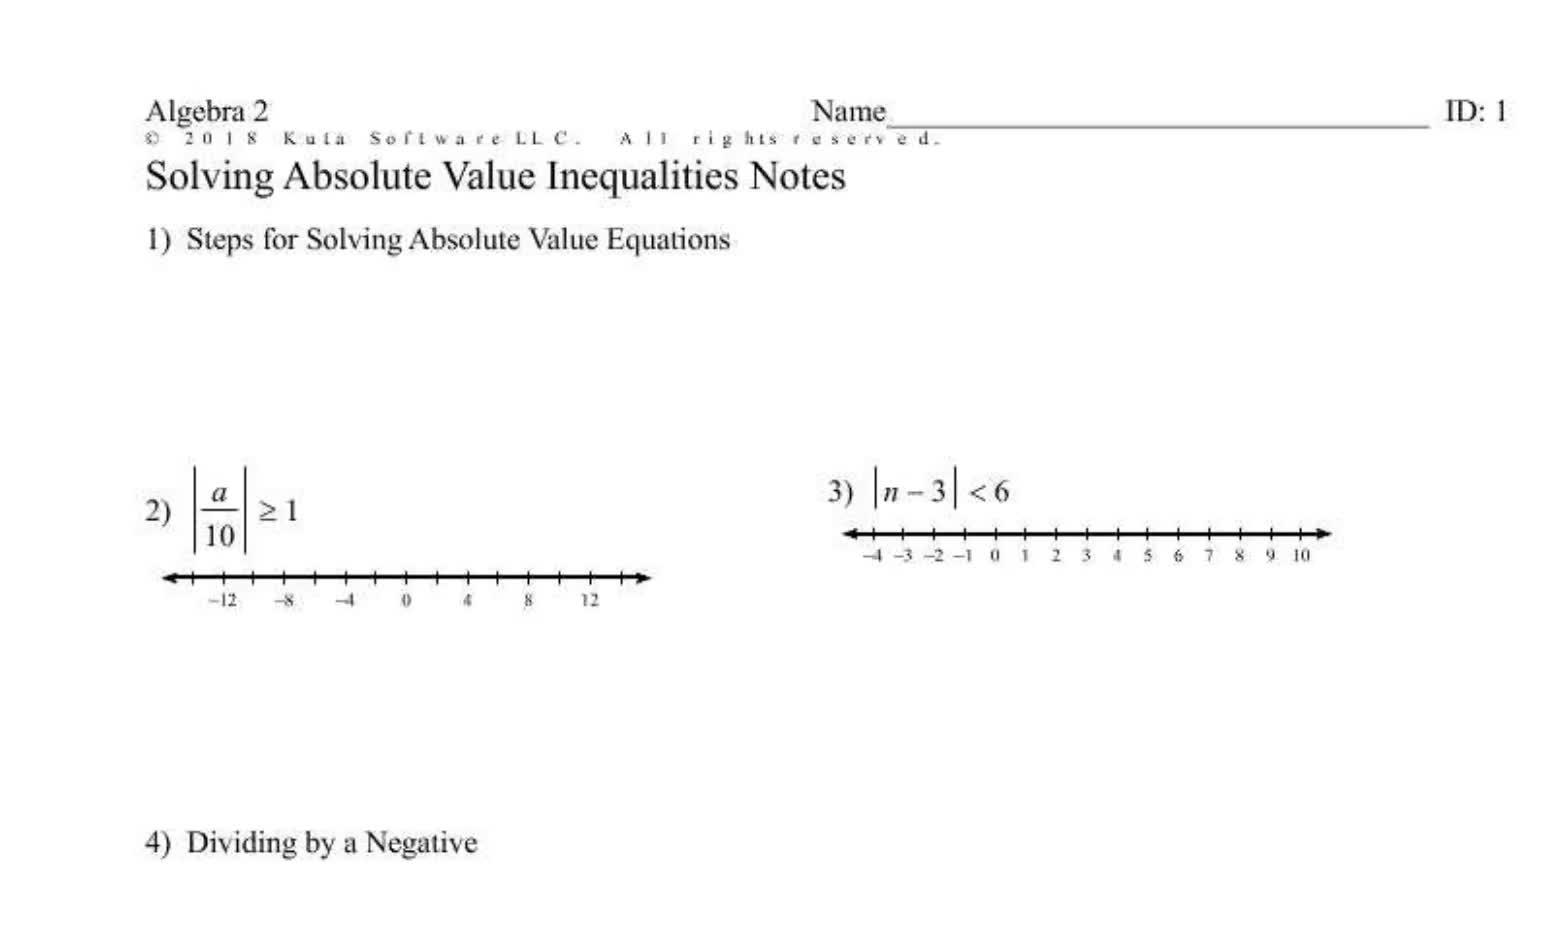 Solving Absolute Value Inequalities (Regular)